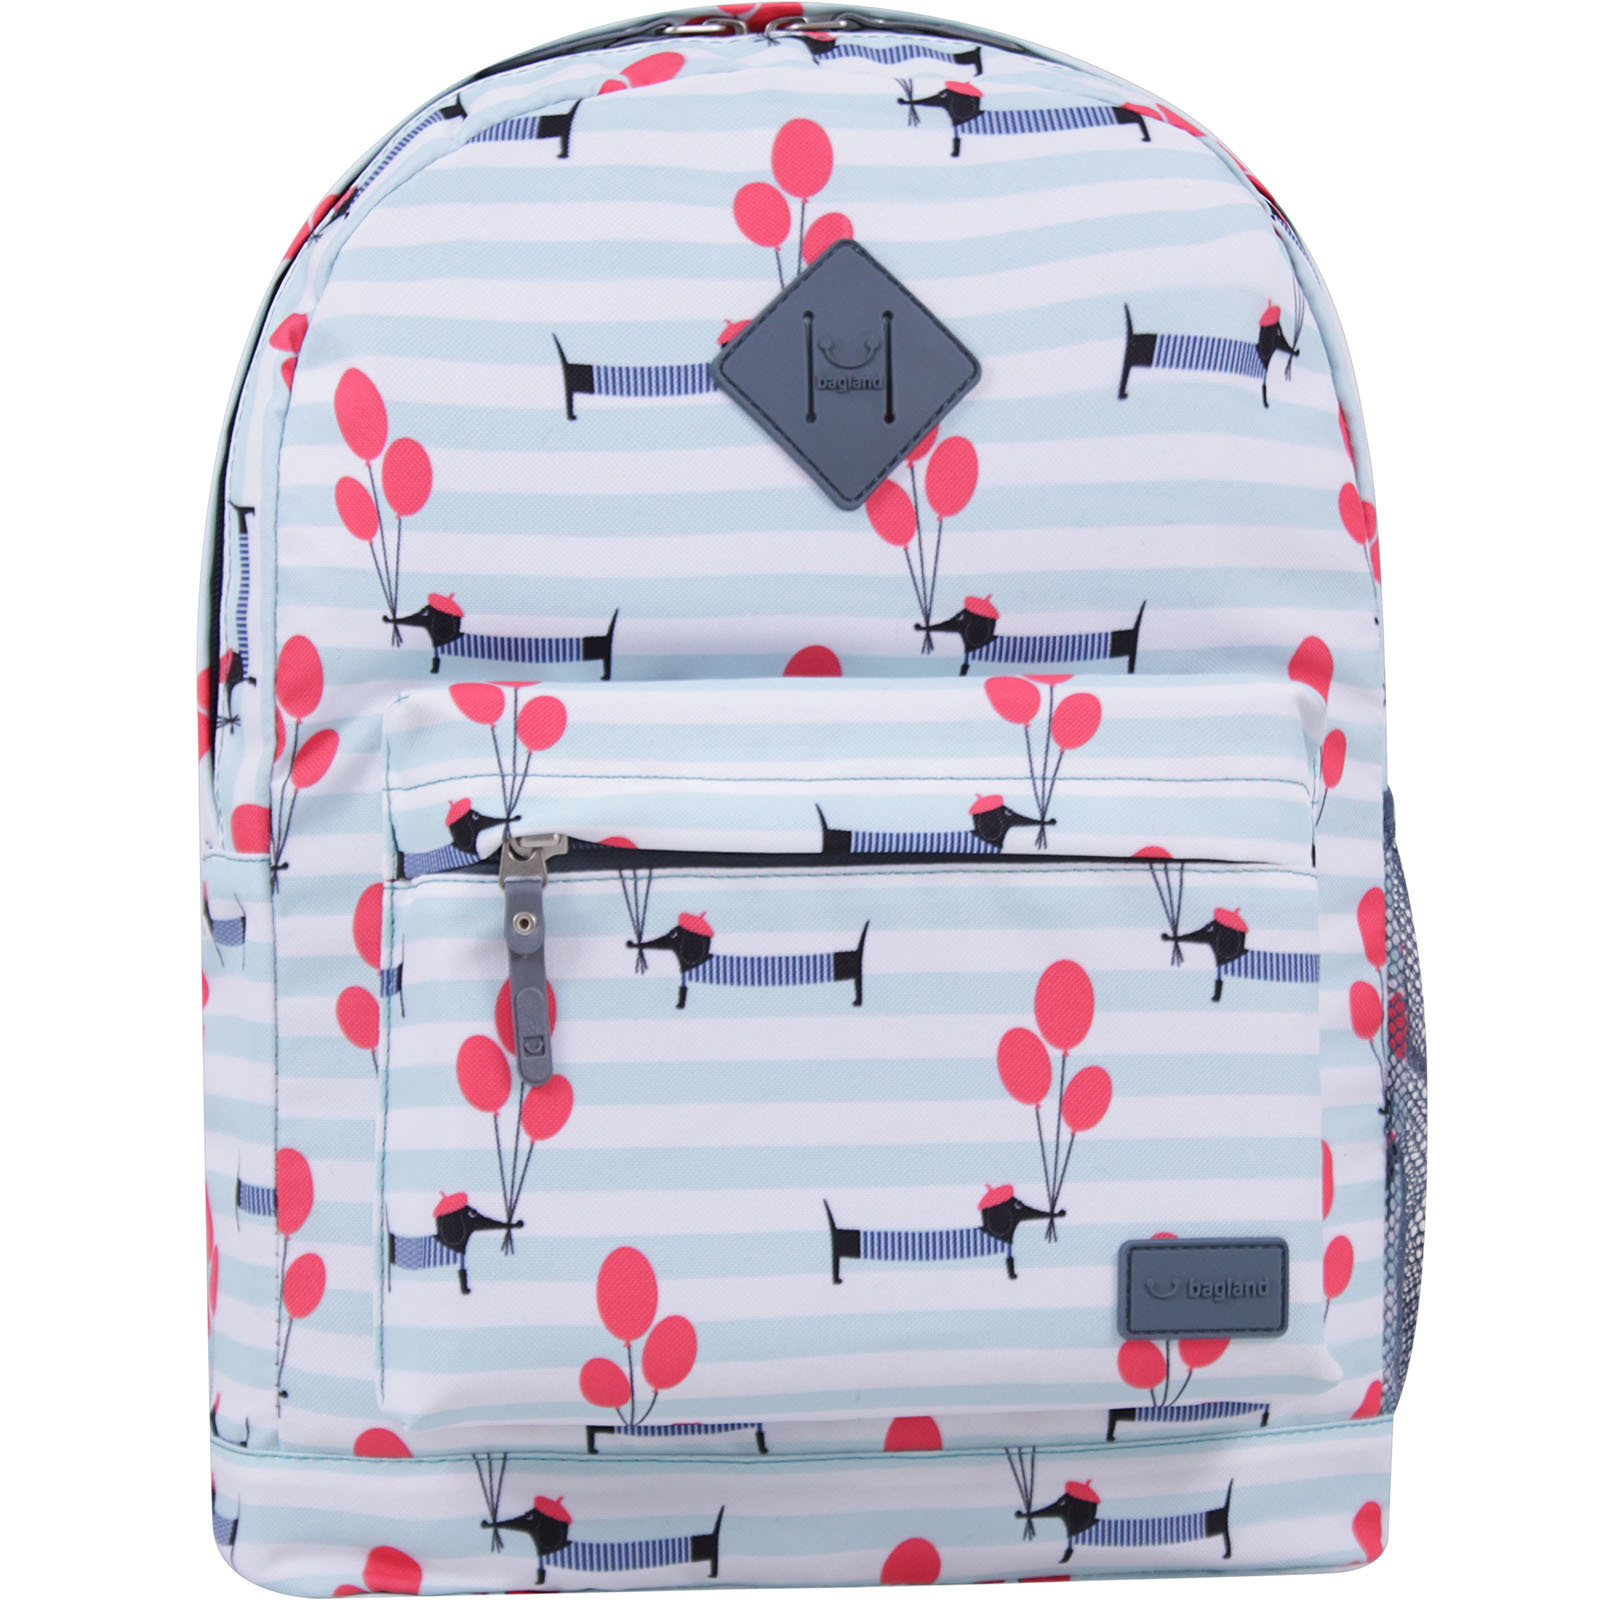 Городские рюкзаки Рюкзак Bagland Молодежный 17 л. сублімація 821 (00533664) IMG_3271_суб821_-1600.jpg